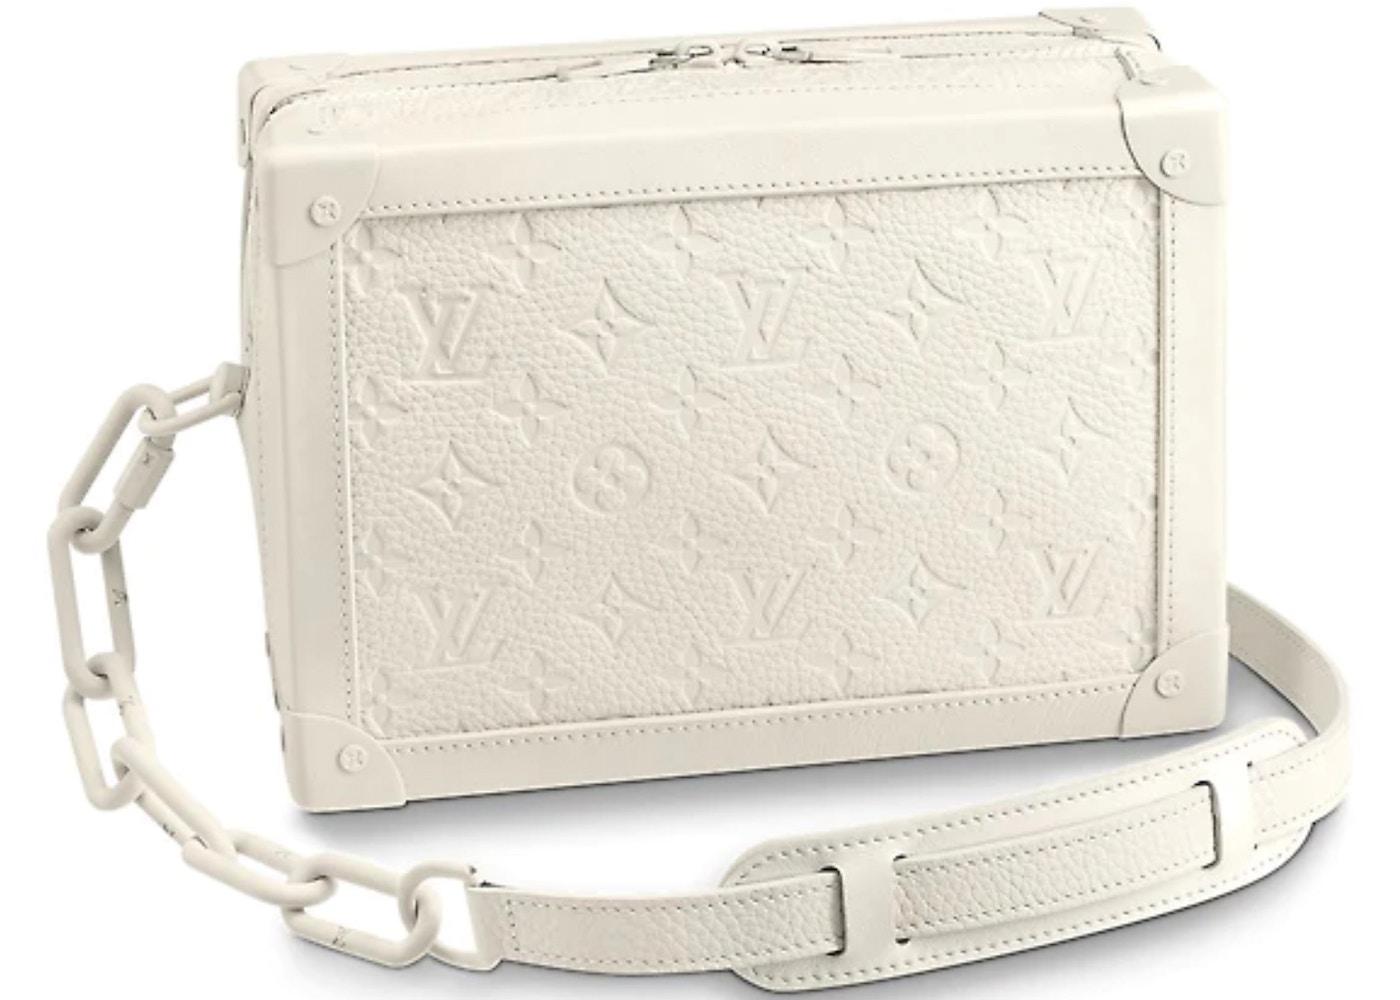 Louis Vuitton Soft Trunk Monogram Powder White